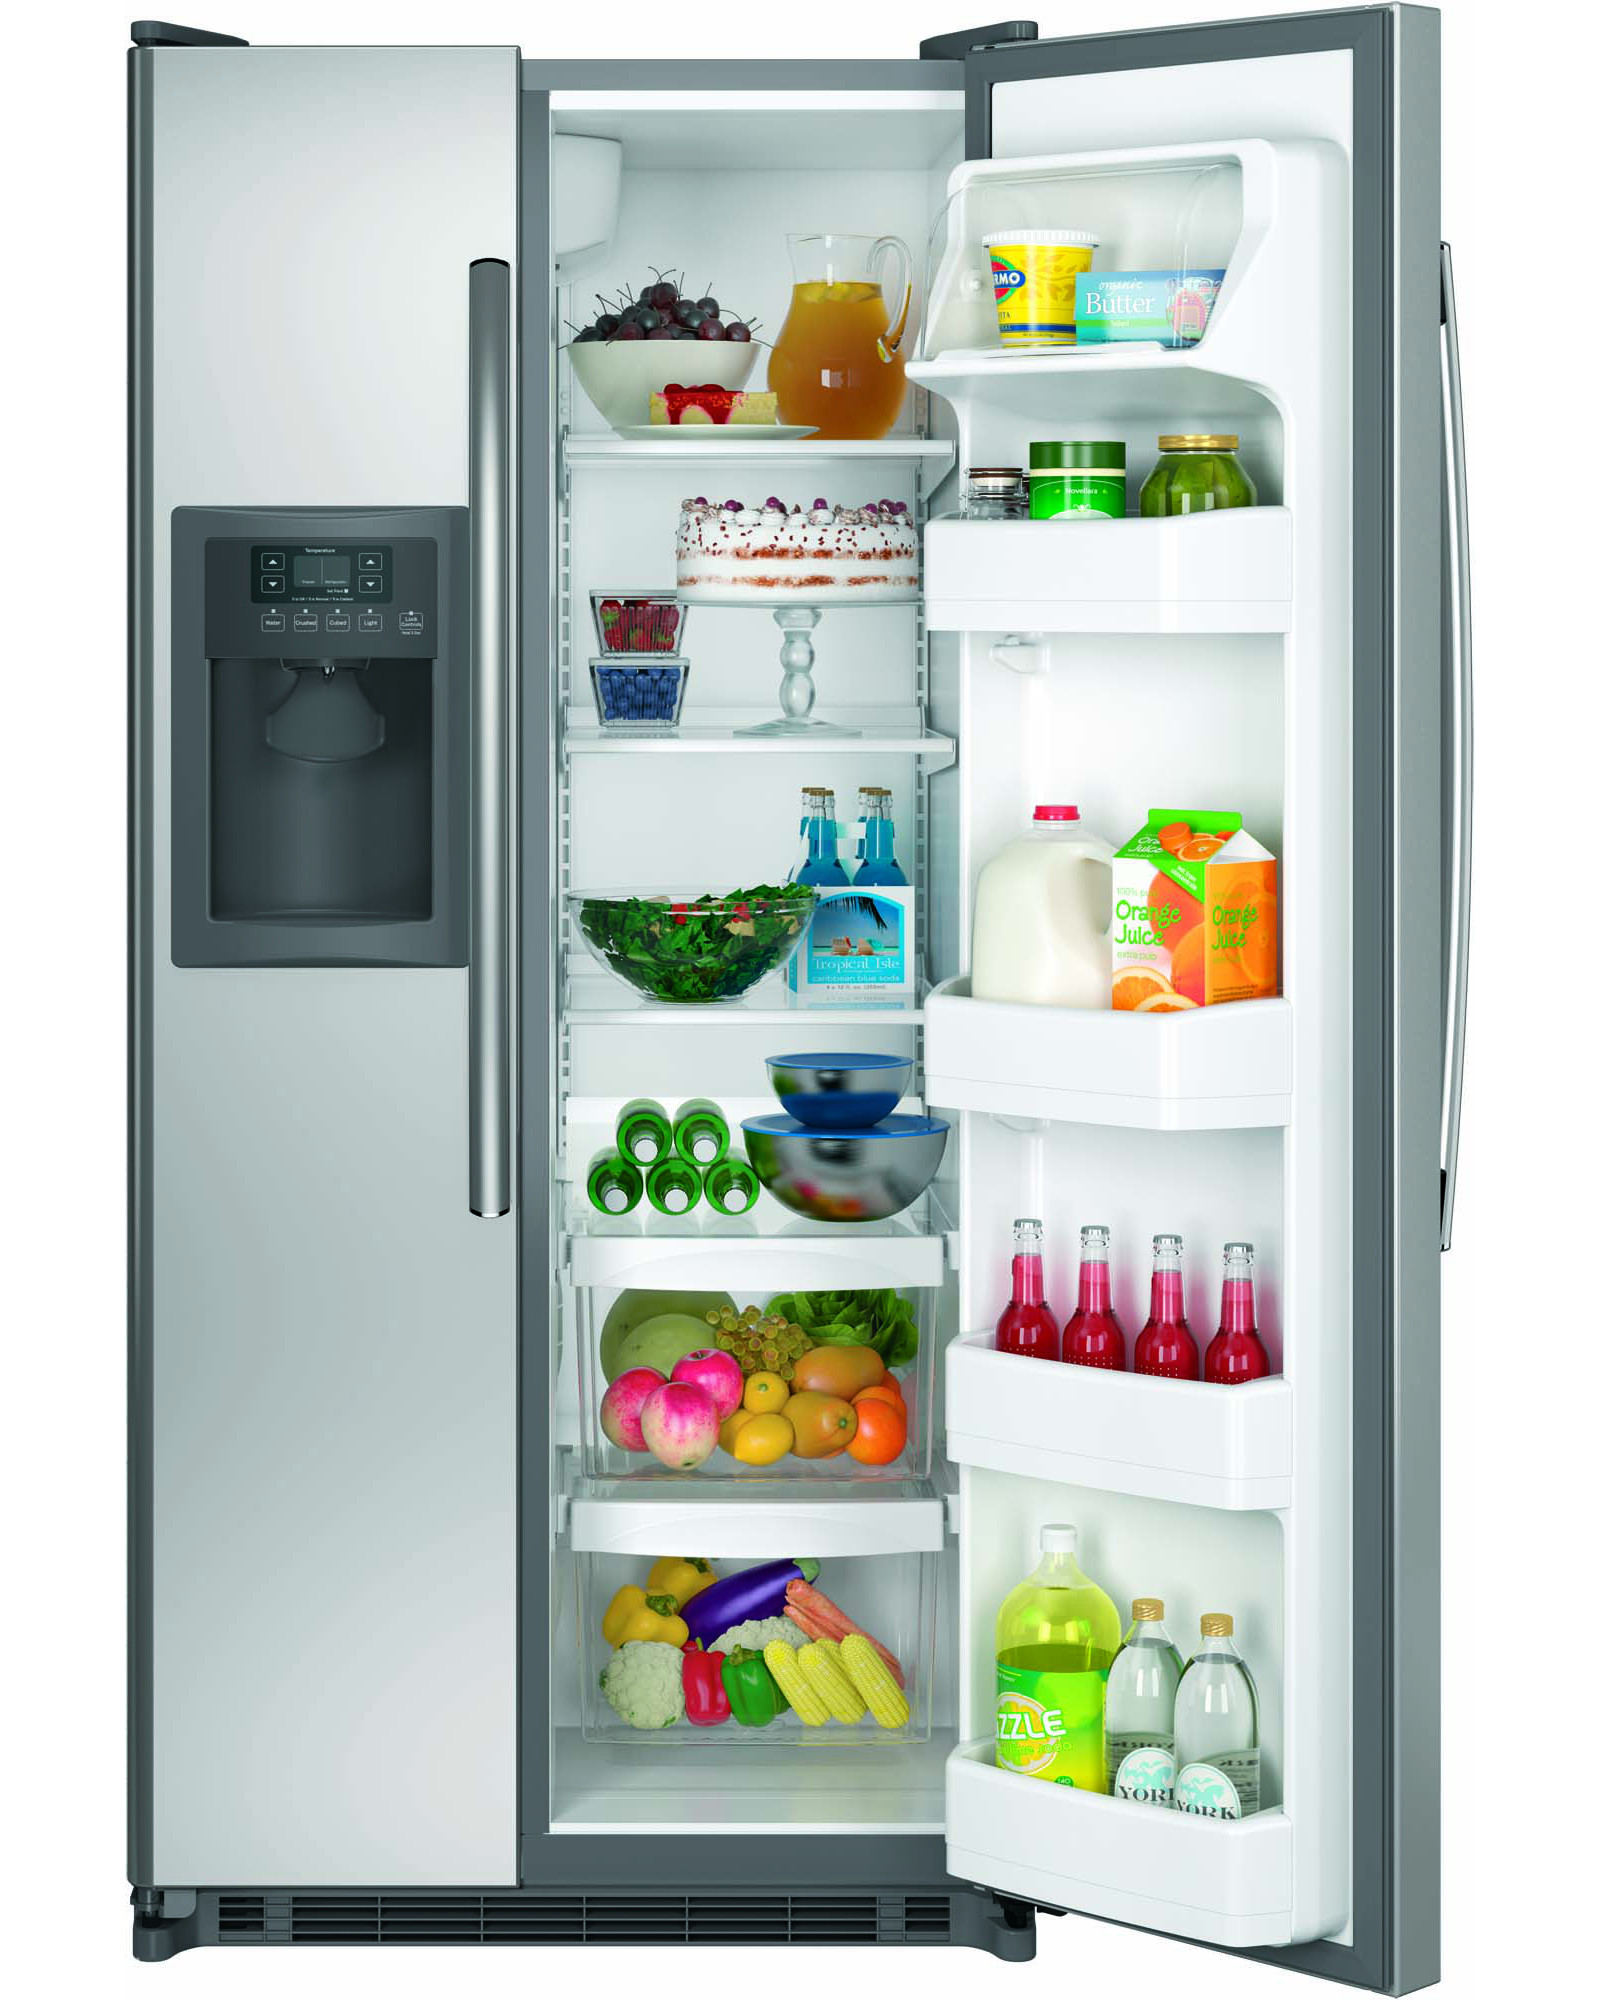 GE Appliances GSS20ESHSS 19.9 cu. ft. Side-by-Side Refrigerator - Stainless Steel